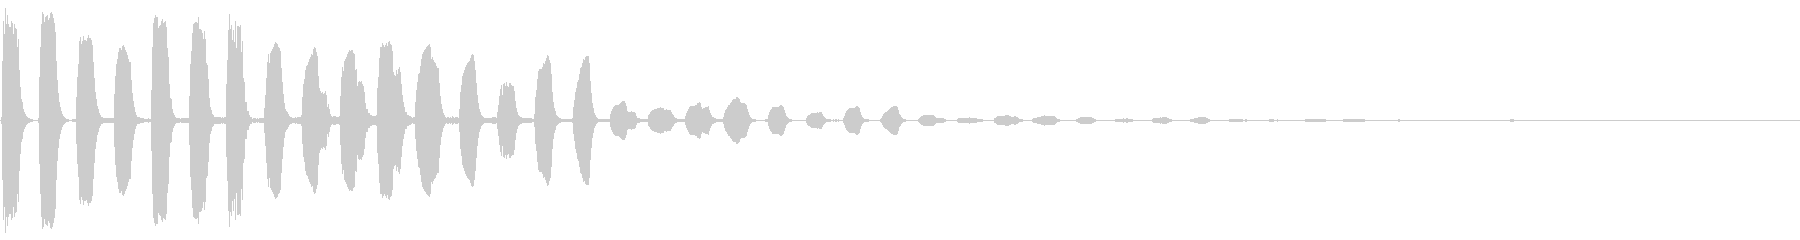 未来的・決定・空気感・取得12の未再生の波形